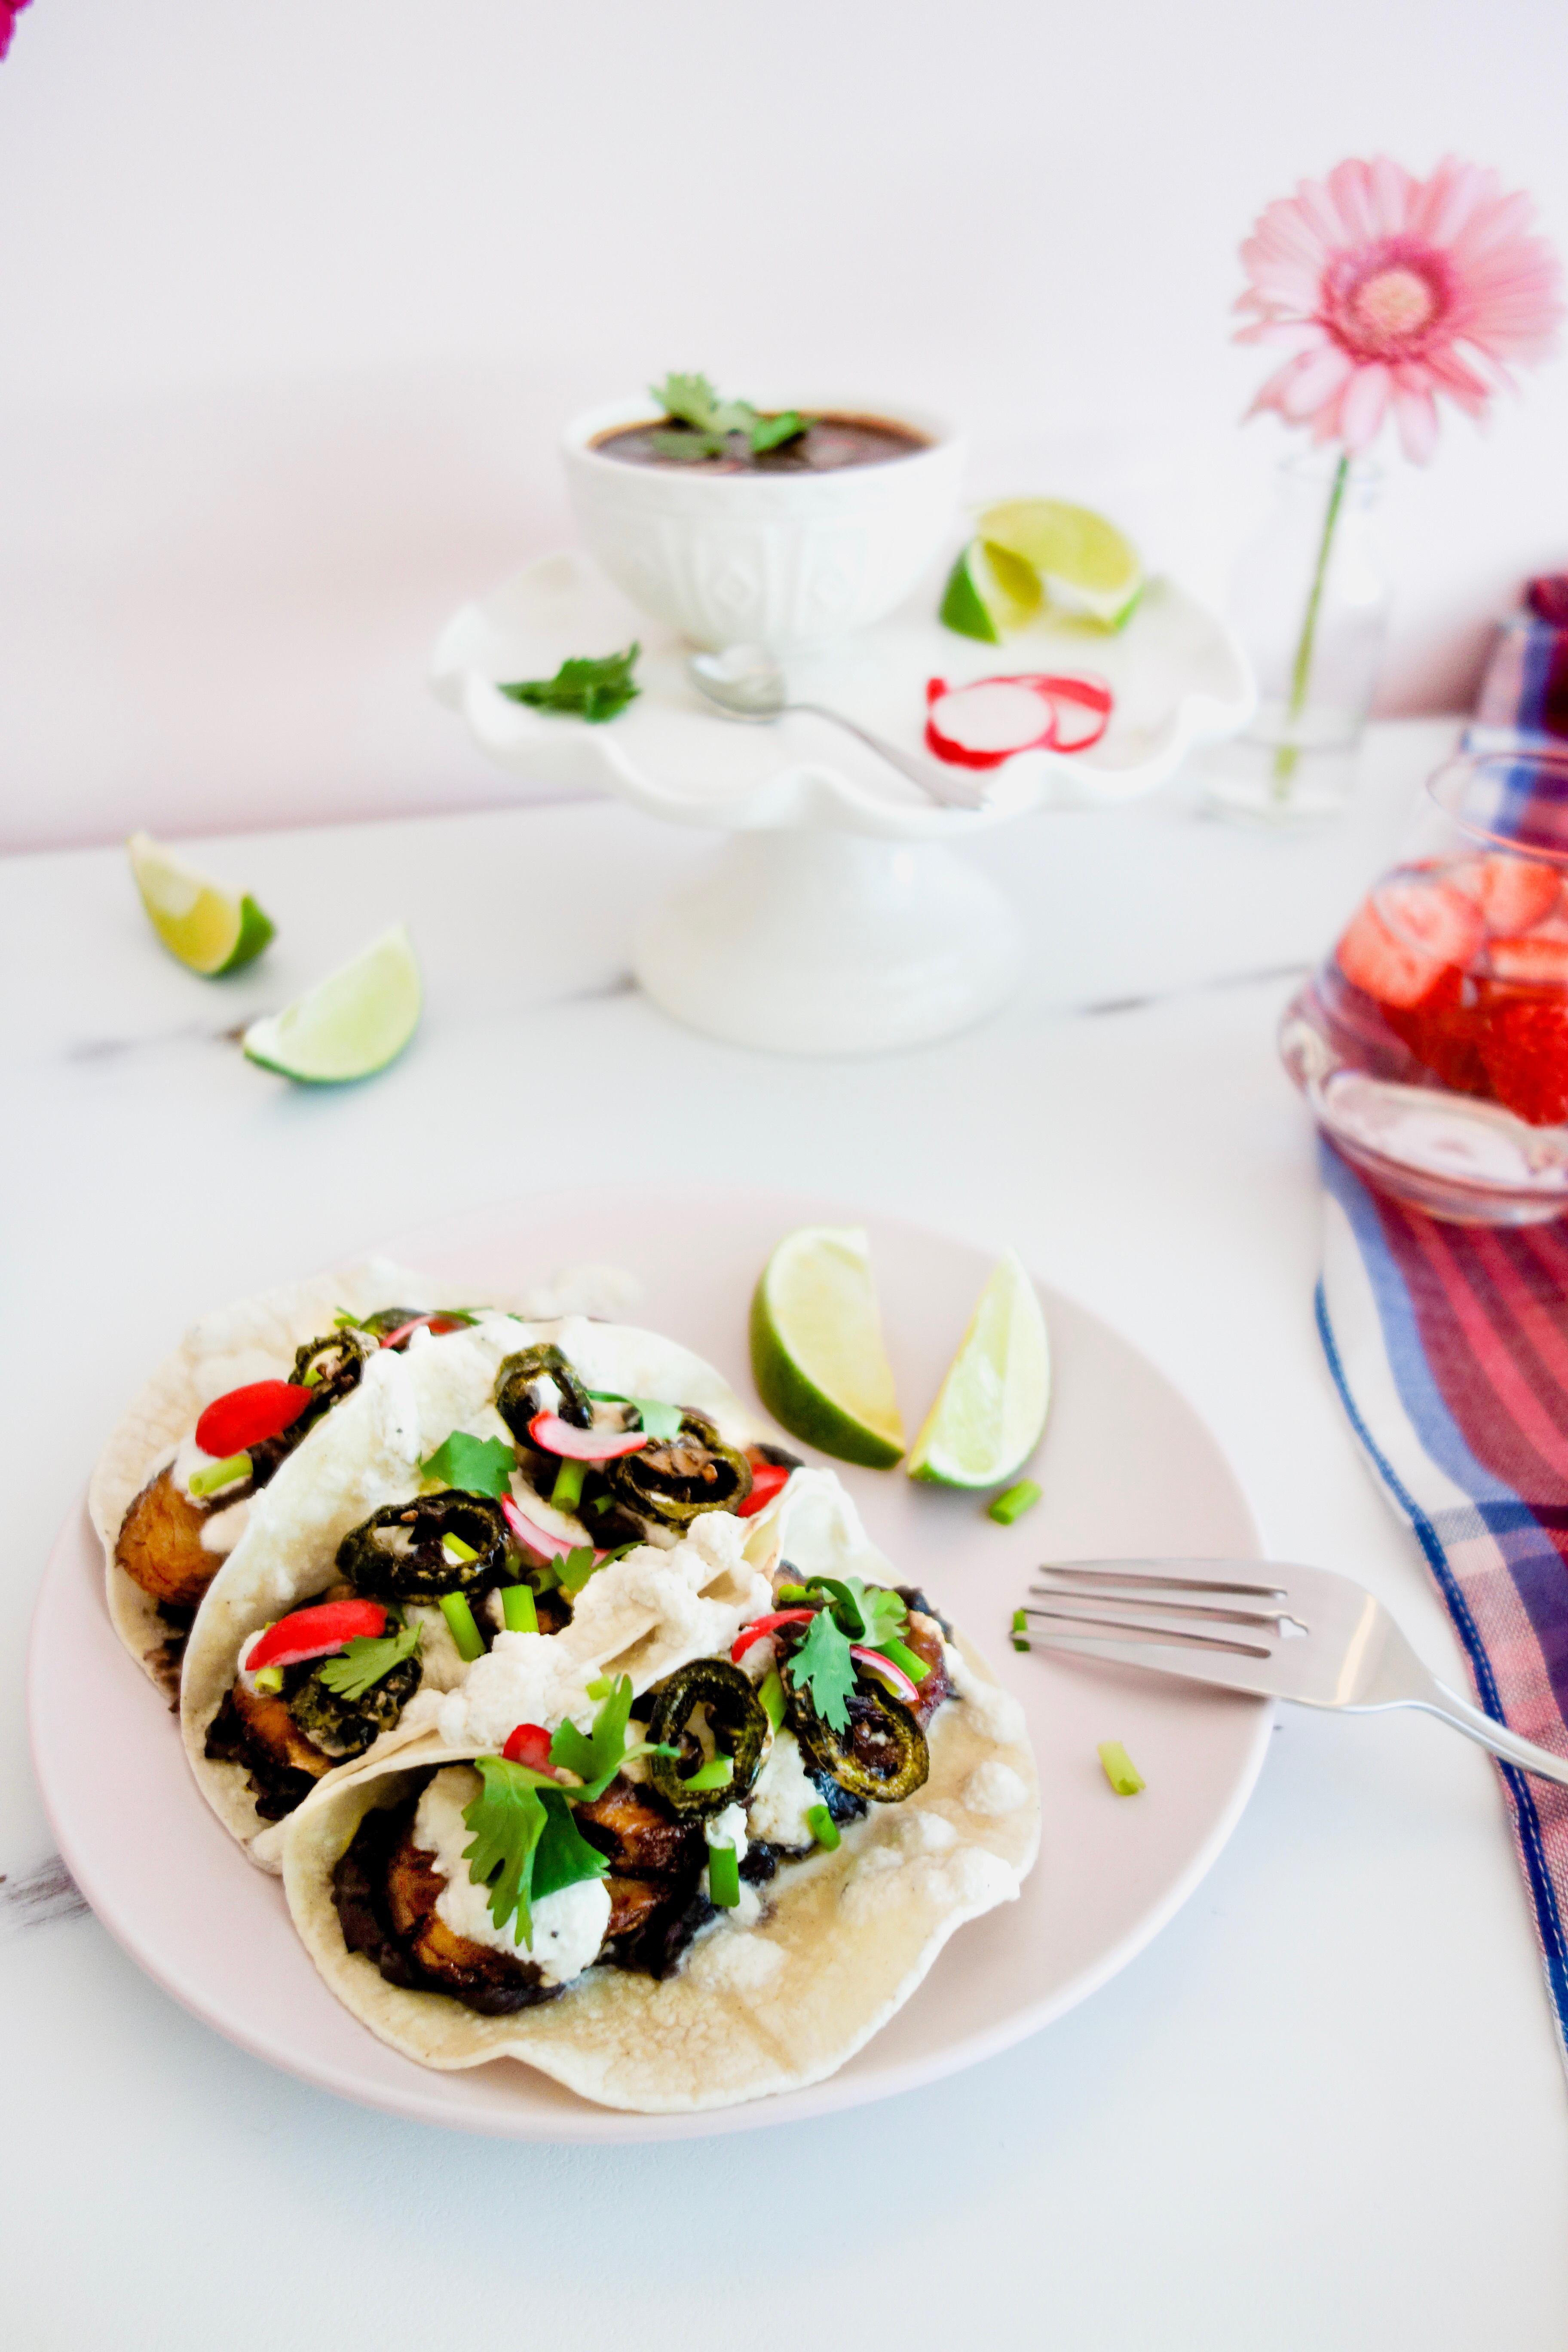 VEGAN PLANTAIN TACOS - #vegan #vegantacos #tacos #easyvegandinner